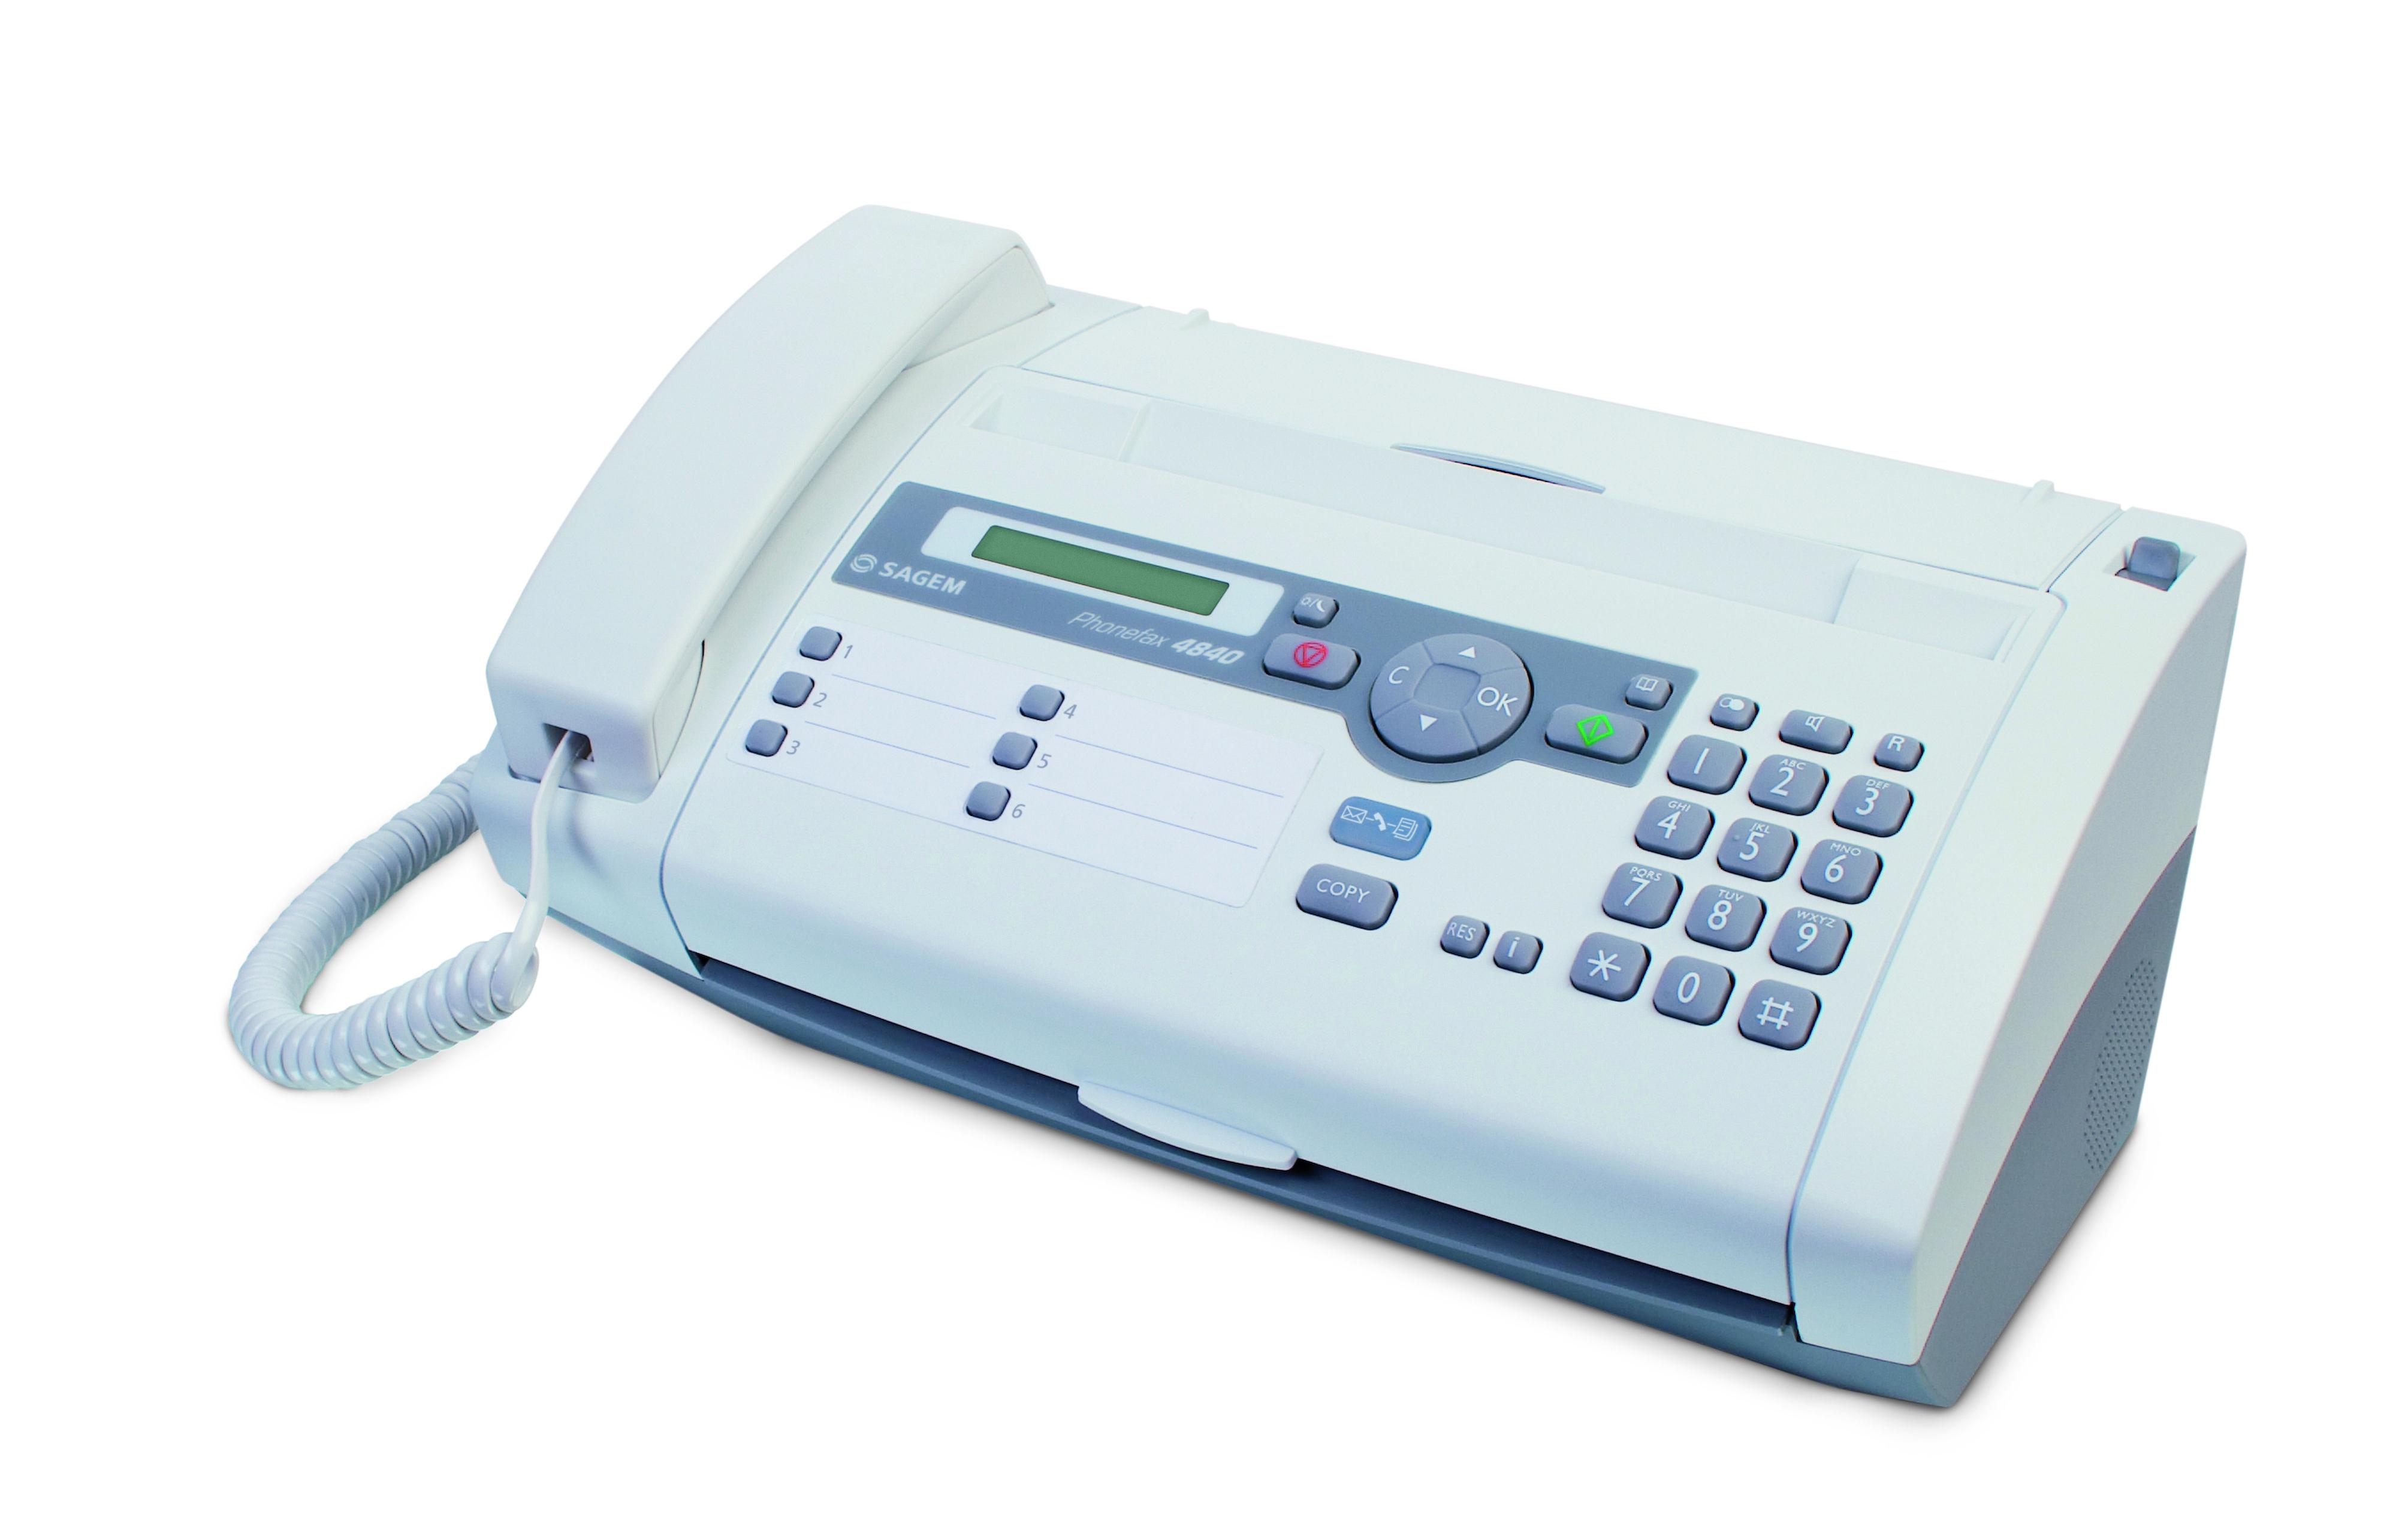 Fax phonefax 4840 34 right hd 4018 x 2539